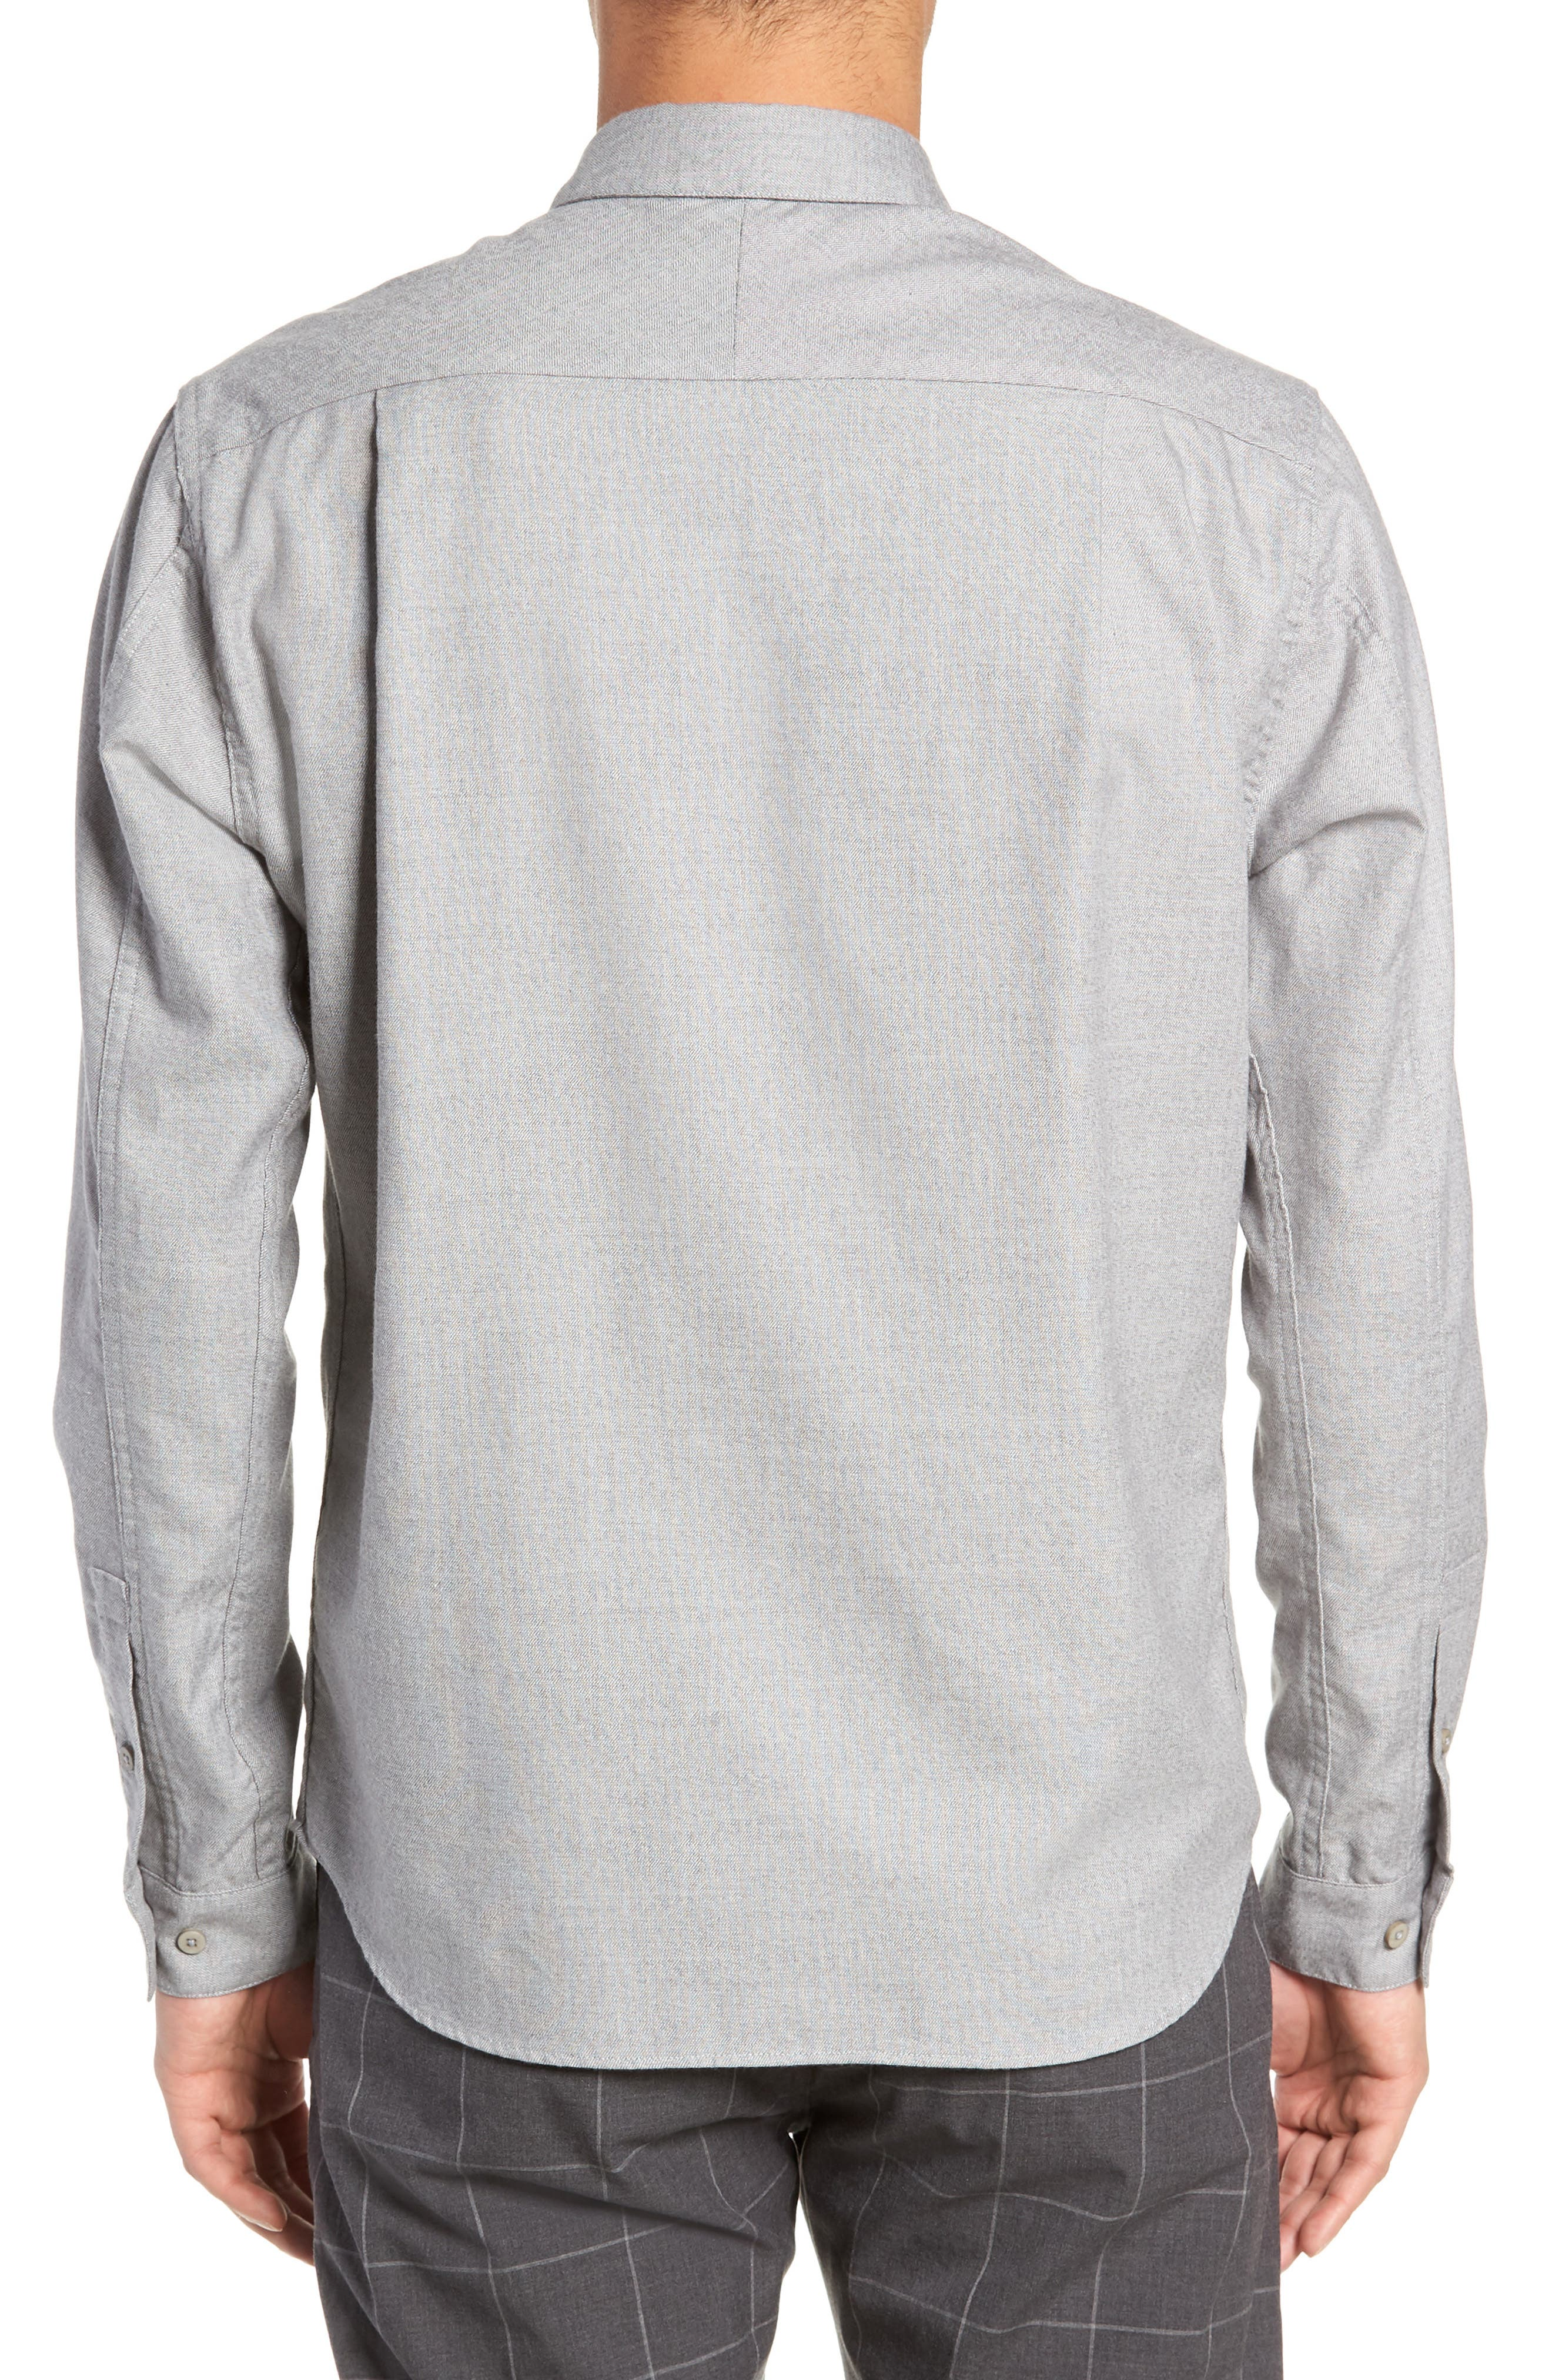 Officer Sport Shirt,                             Alternate thumbnail 3, color,                             MEDIUM GREY